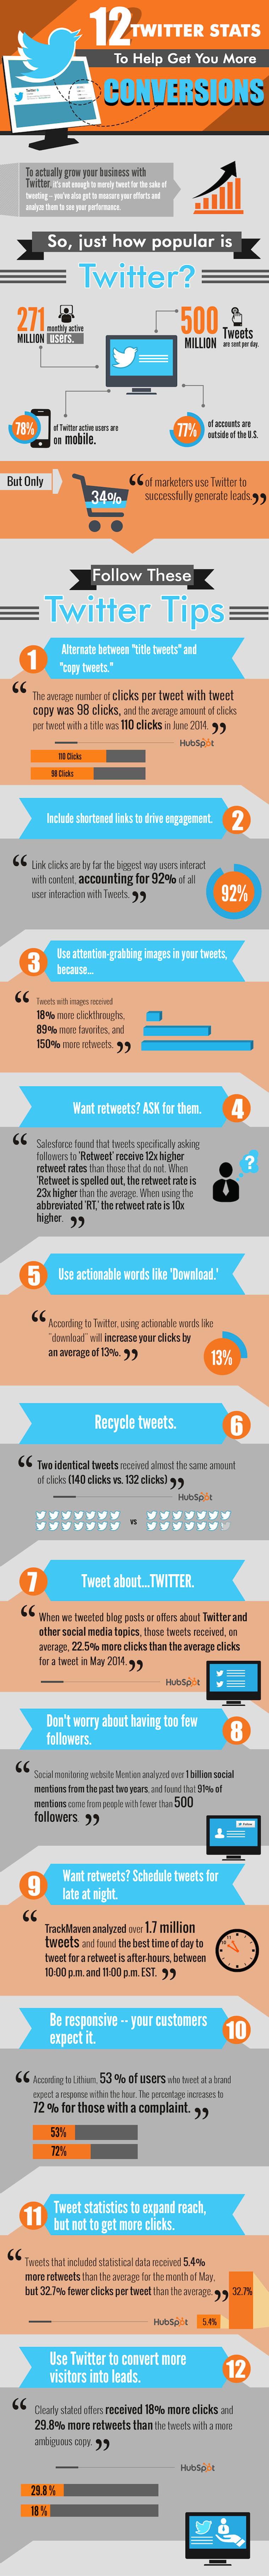 12 Tips para Aumentar tus Conversiones en Twitter